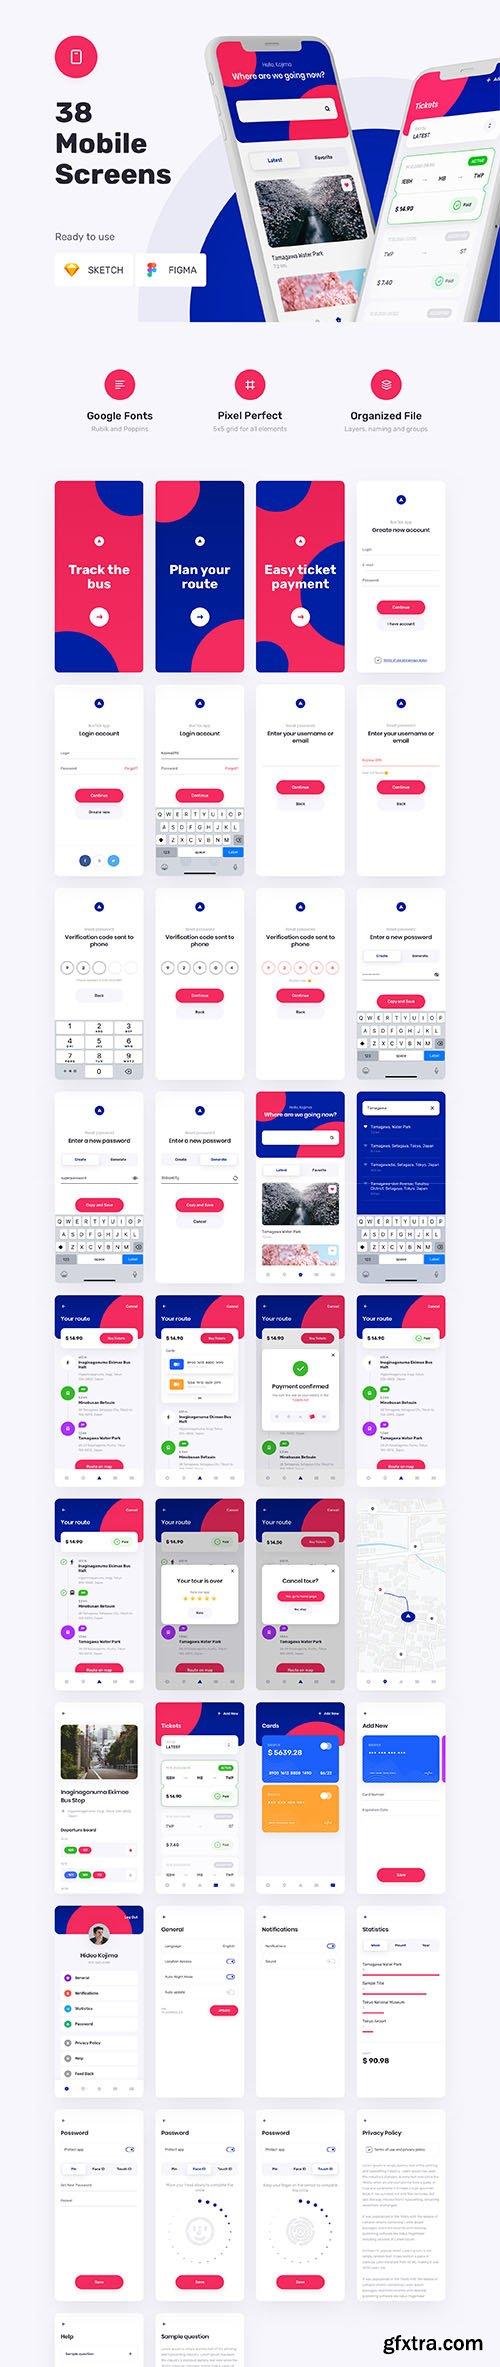 TBusBuy - Public Transport App